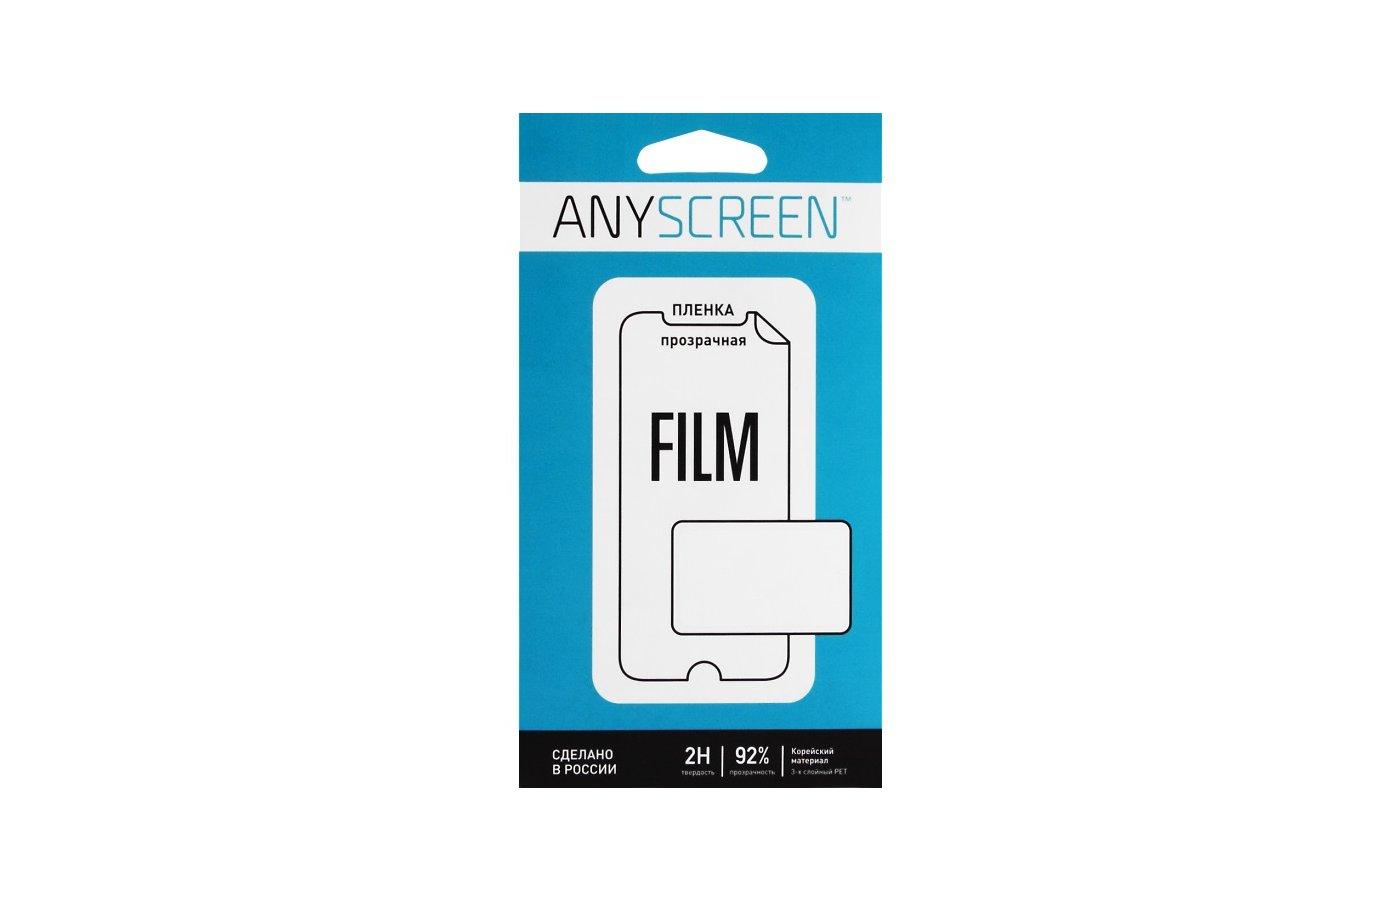 Стекло AnyScreen пленка для ZTE Blade GF3 прозрачная